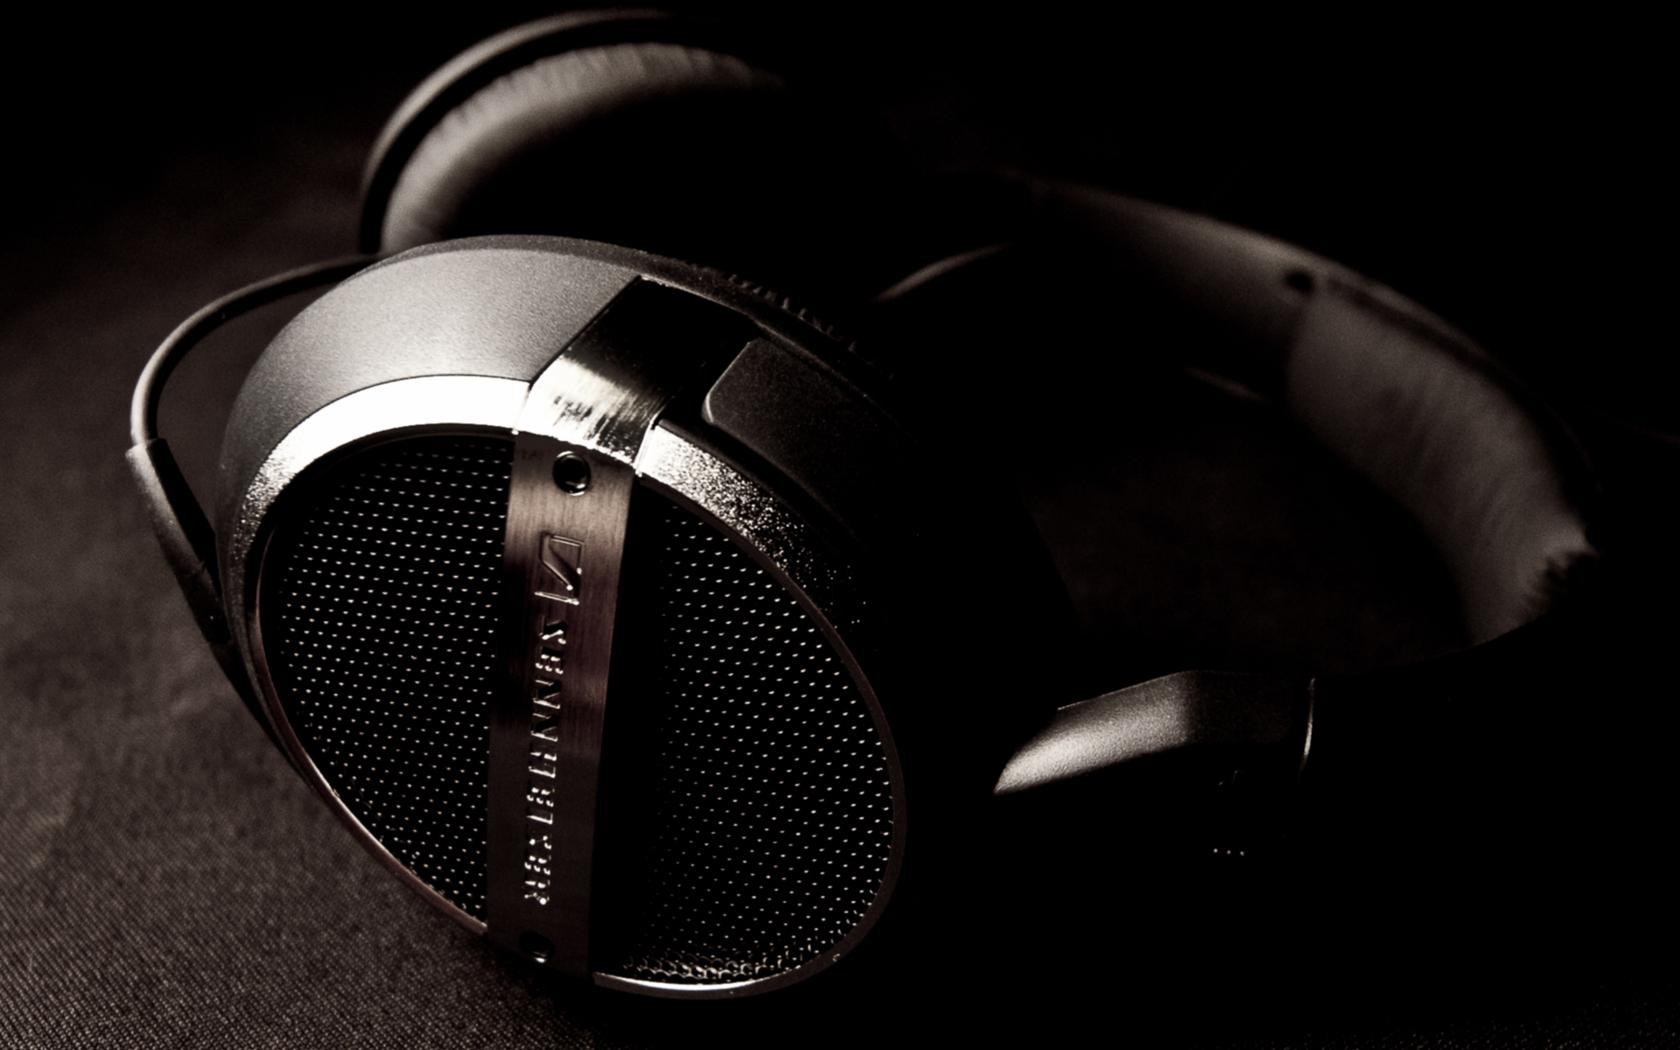 Music Headphones 1680x1050